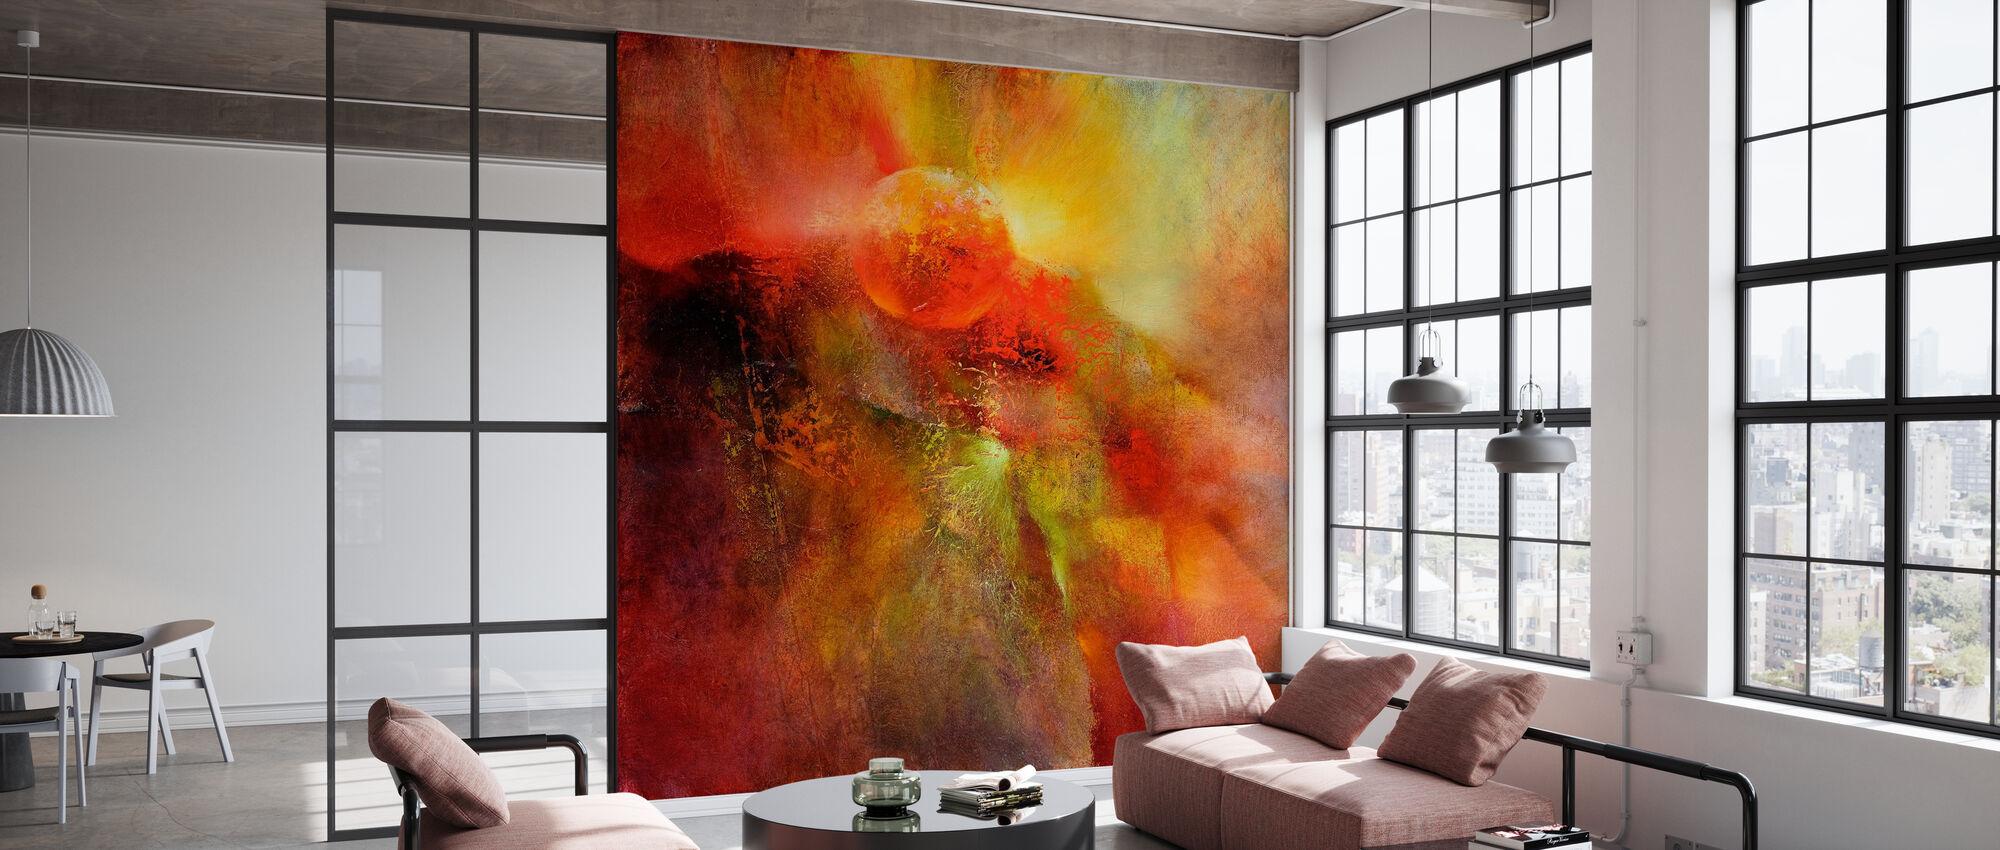 Floating - Wallpaper - Office